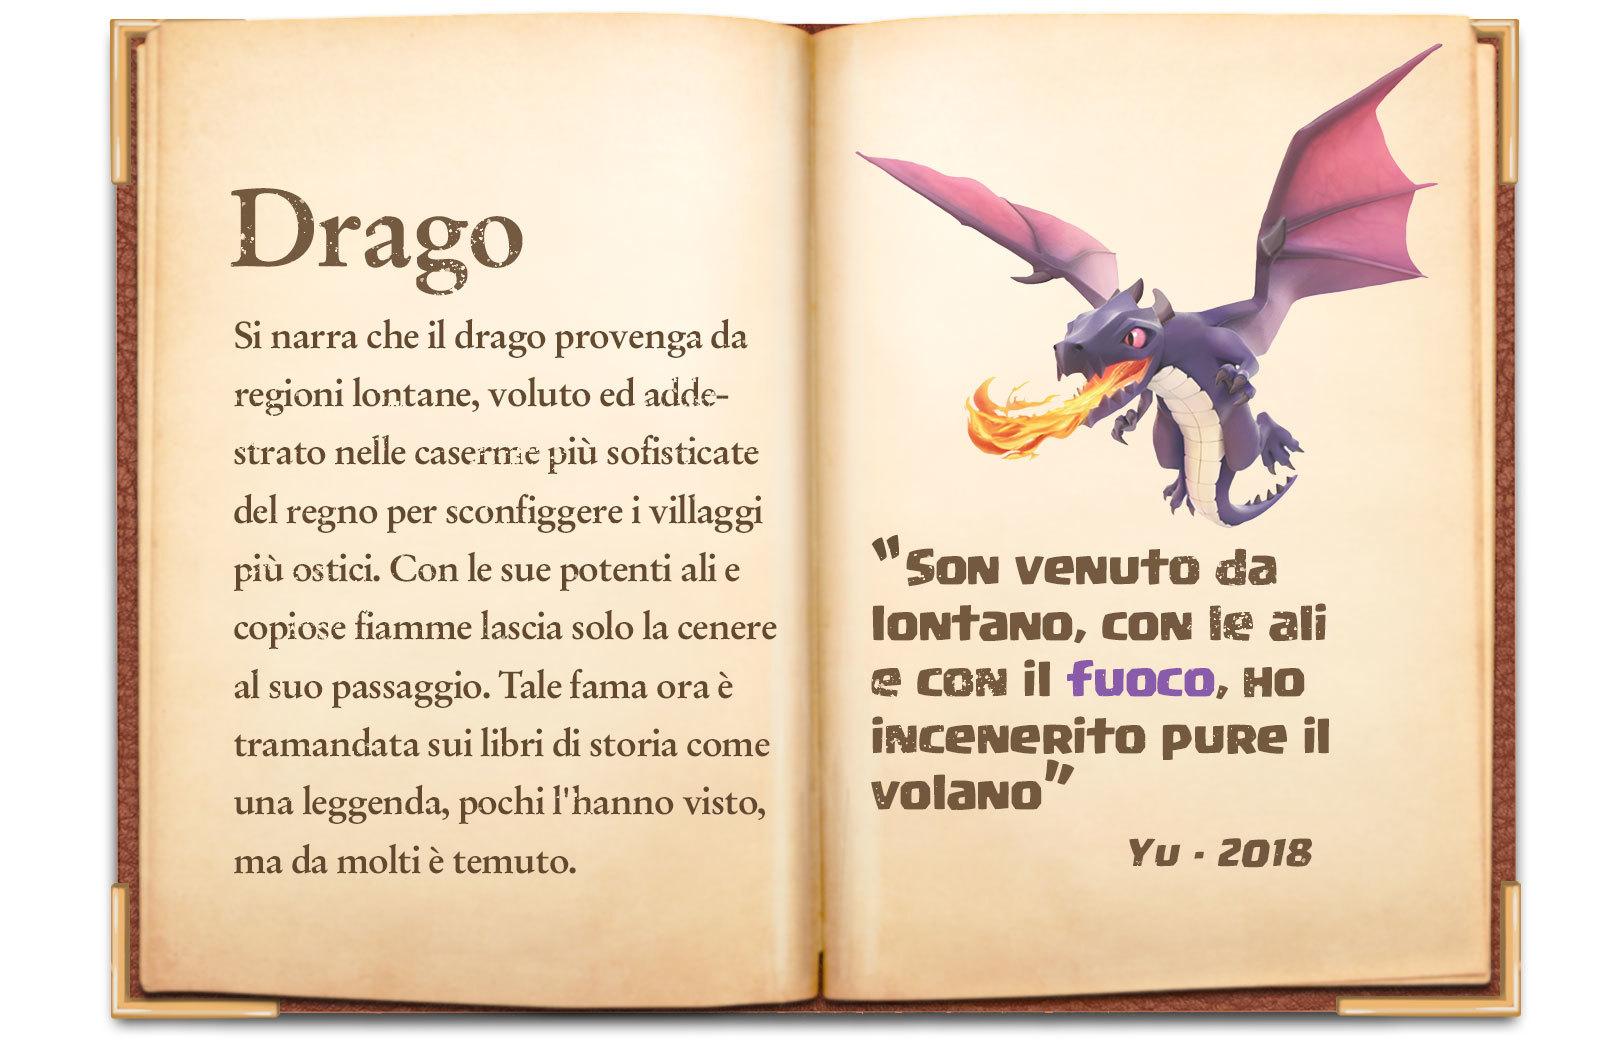 Ita_CoC_Clanslator_Book_1_DragoFull.jpg?mtime=20180601060641#asset:5853